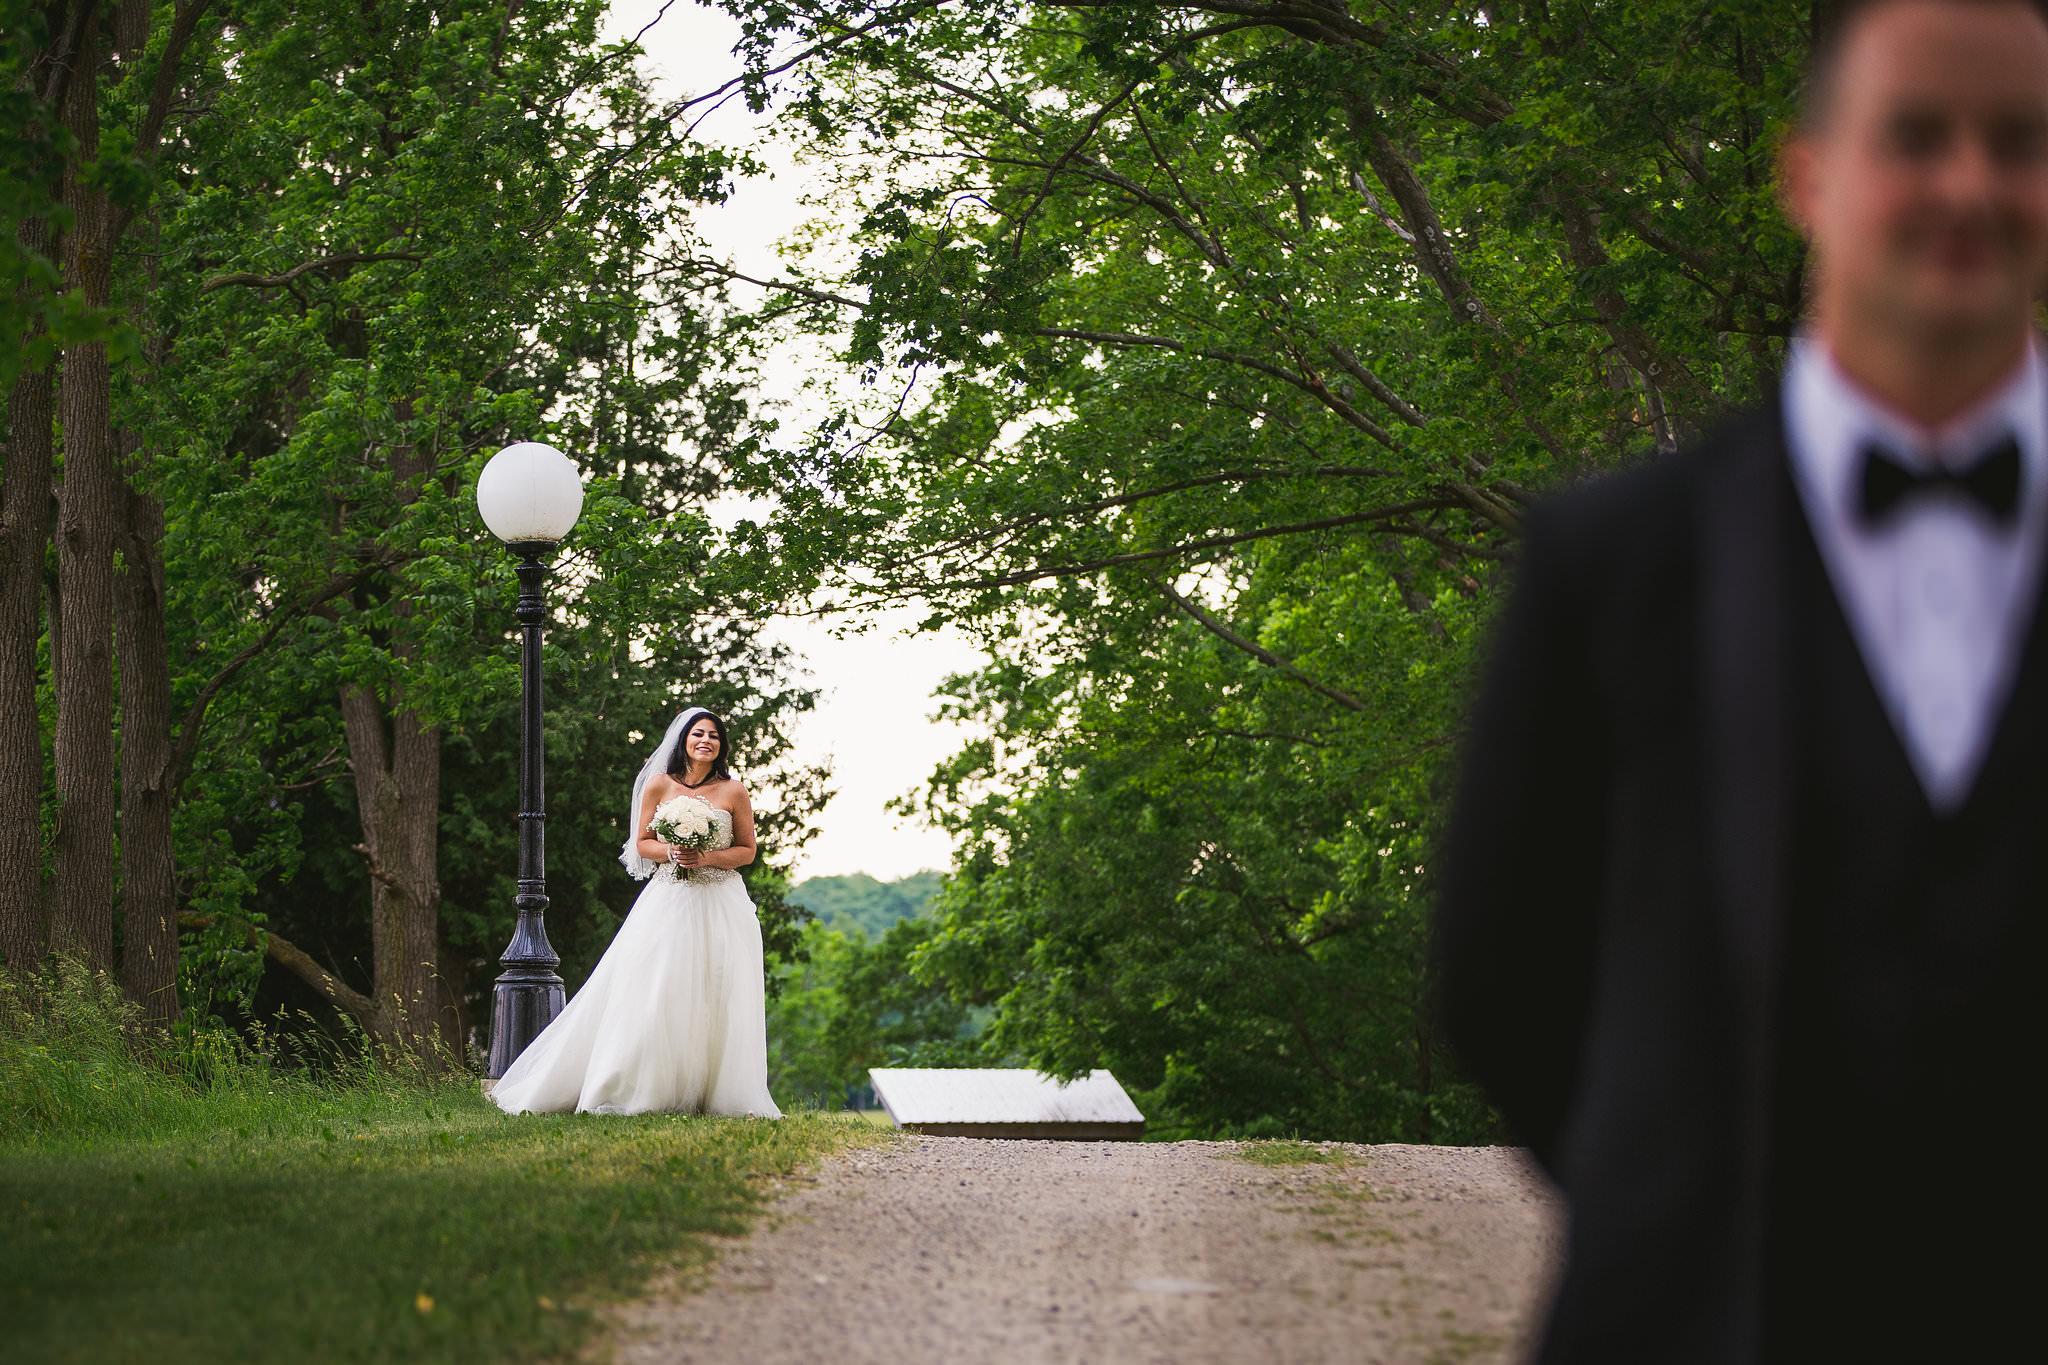 Marguerite Wayne Stoneacre Farm Puslinch Wedding Photos 206 - Stoneacre Farm Wedding